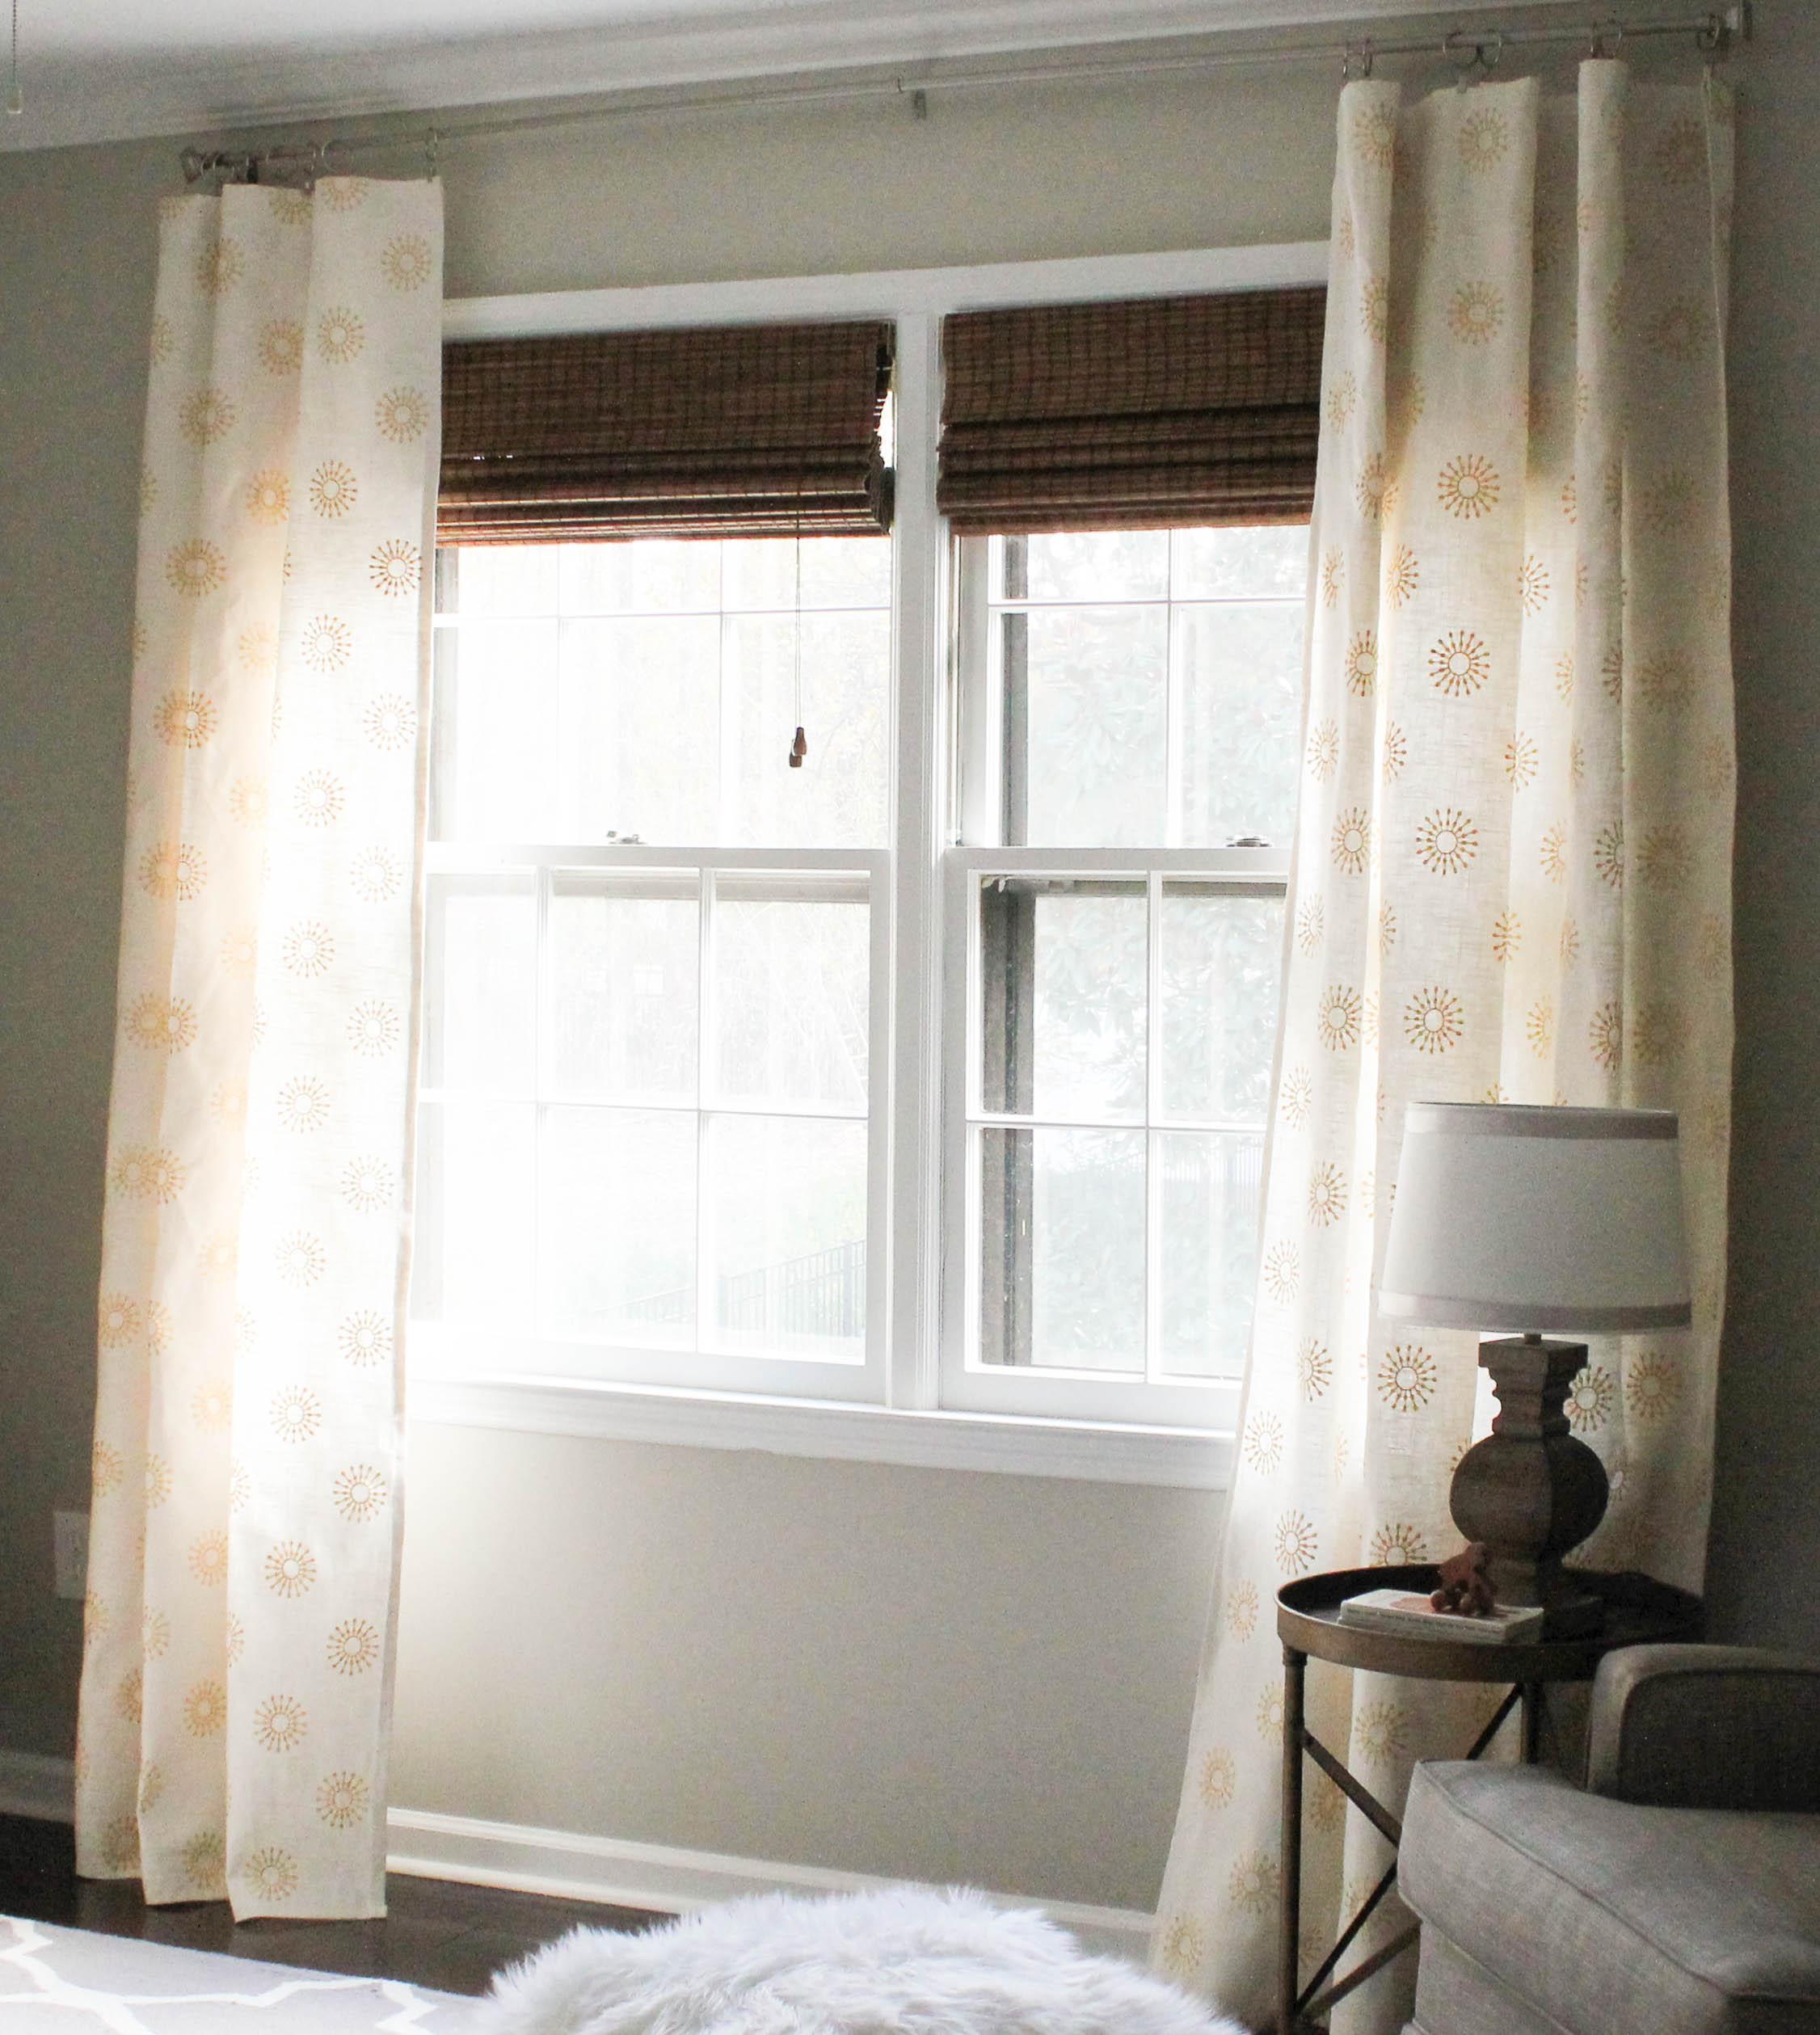 DIY Window Curtains Aka Facing My Sewing Machine Fears